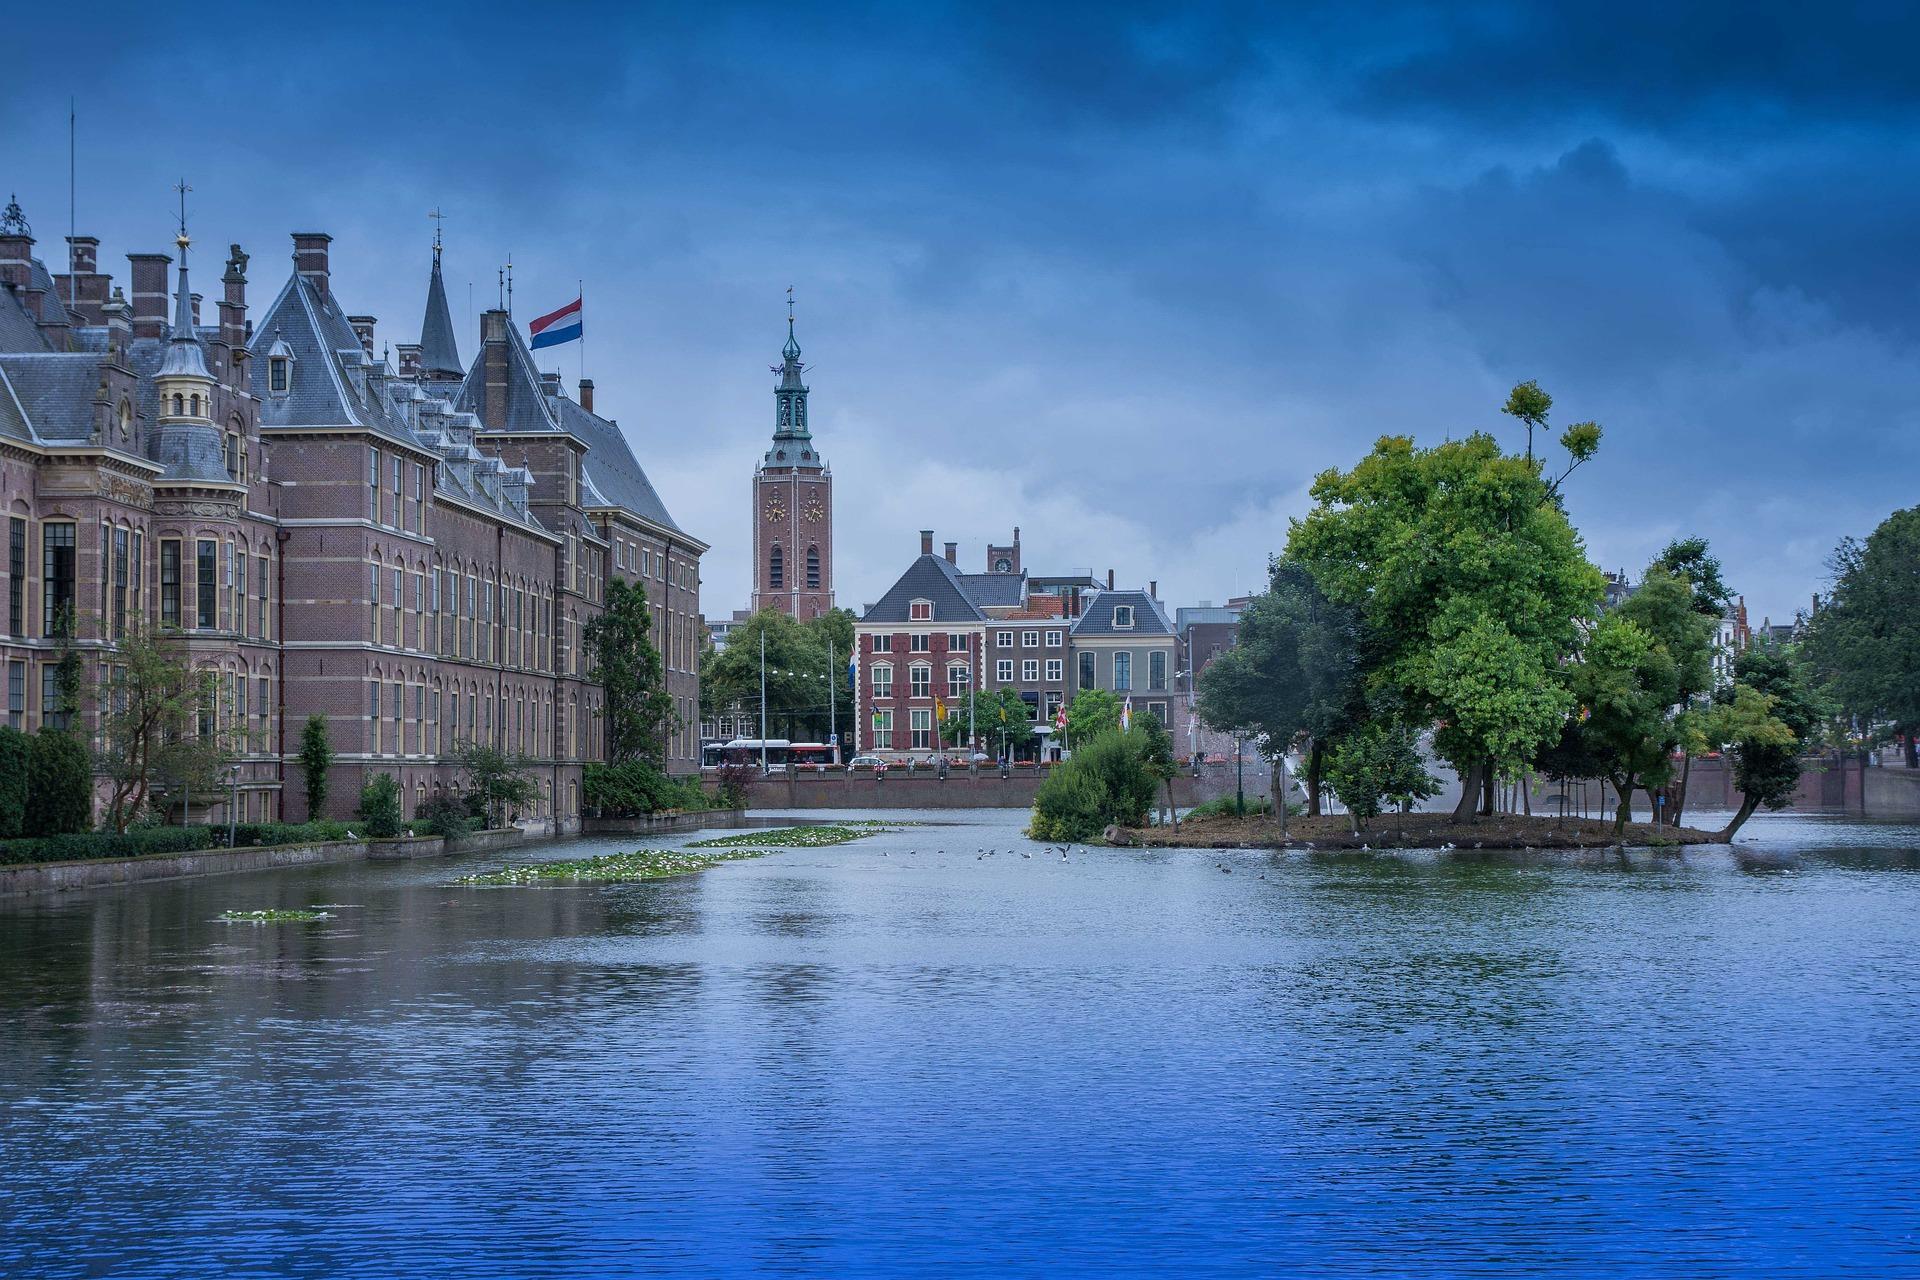 deen haag_the hague_netherlands_niederlande_holland